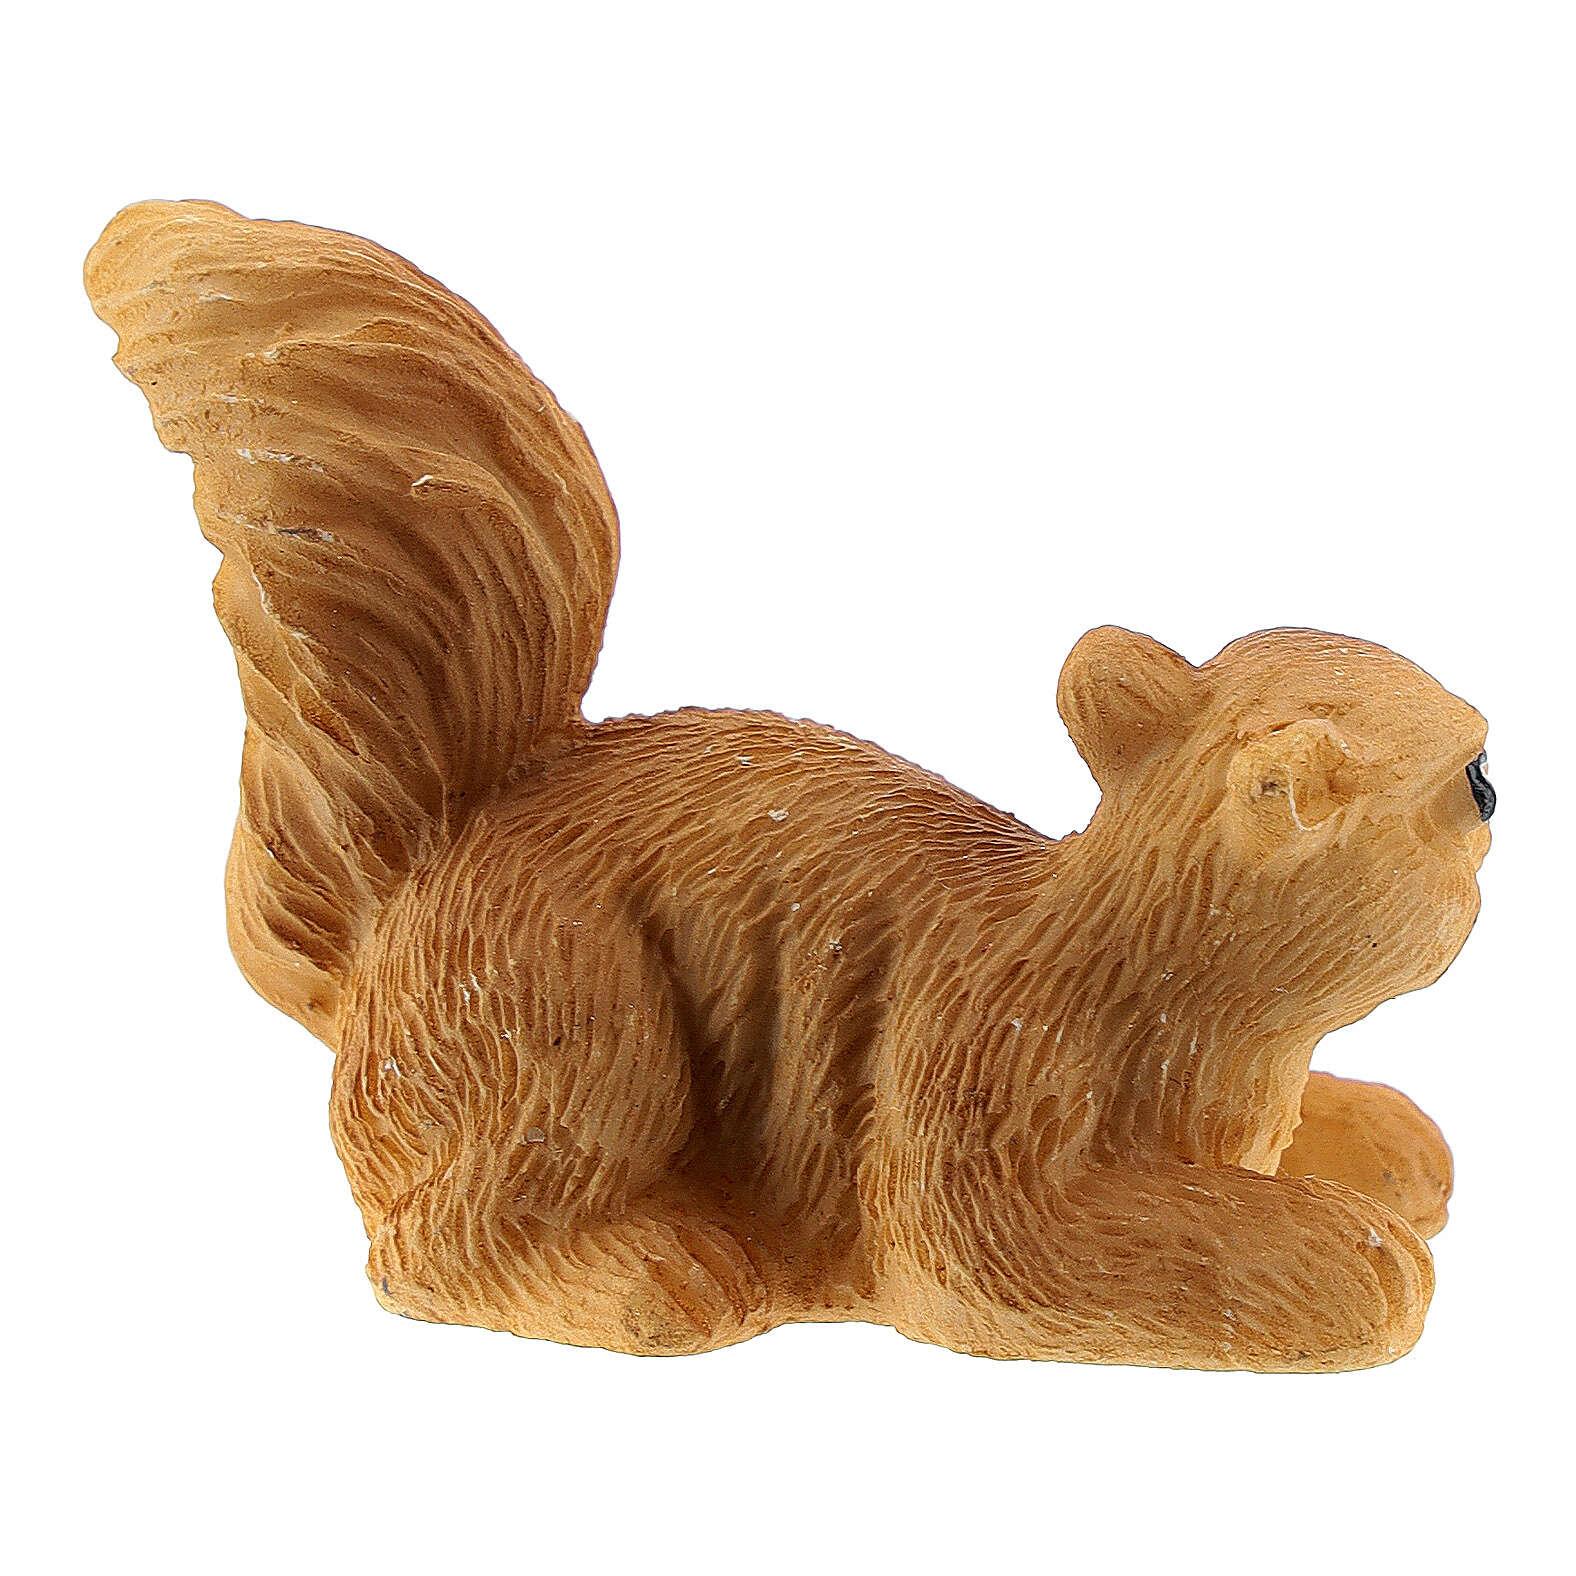 Squirrel 3 cm for Nativity scene 14-18 cm 3